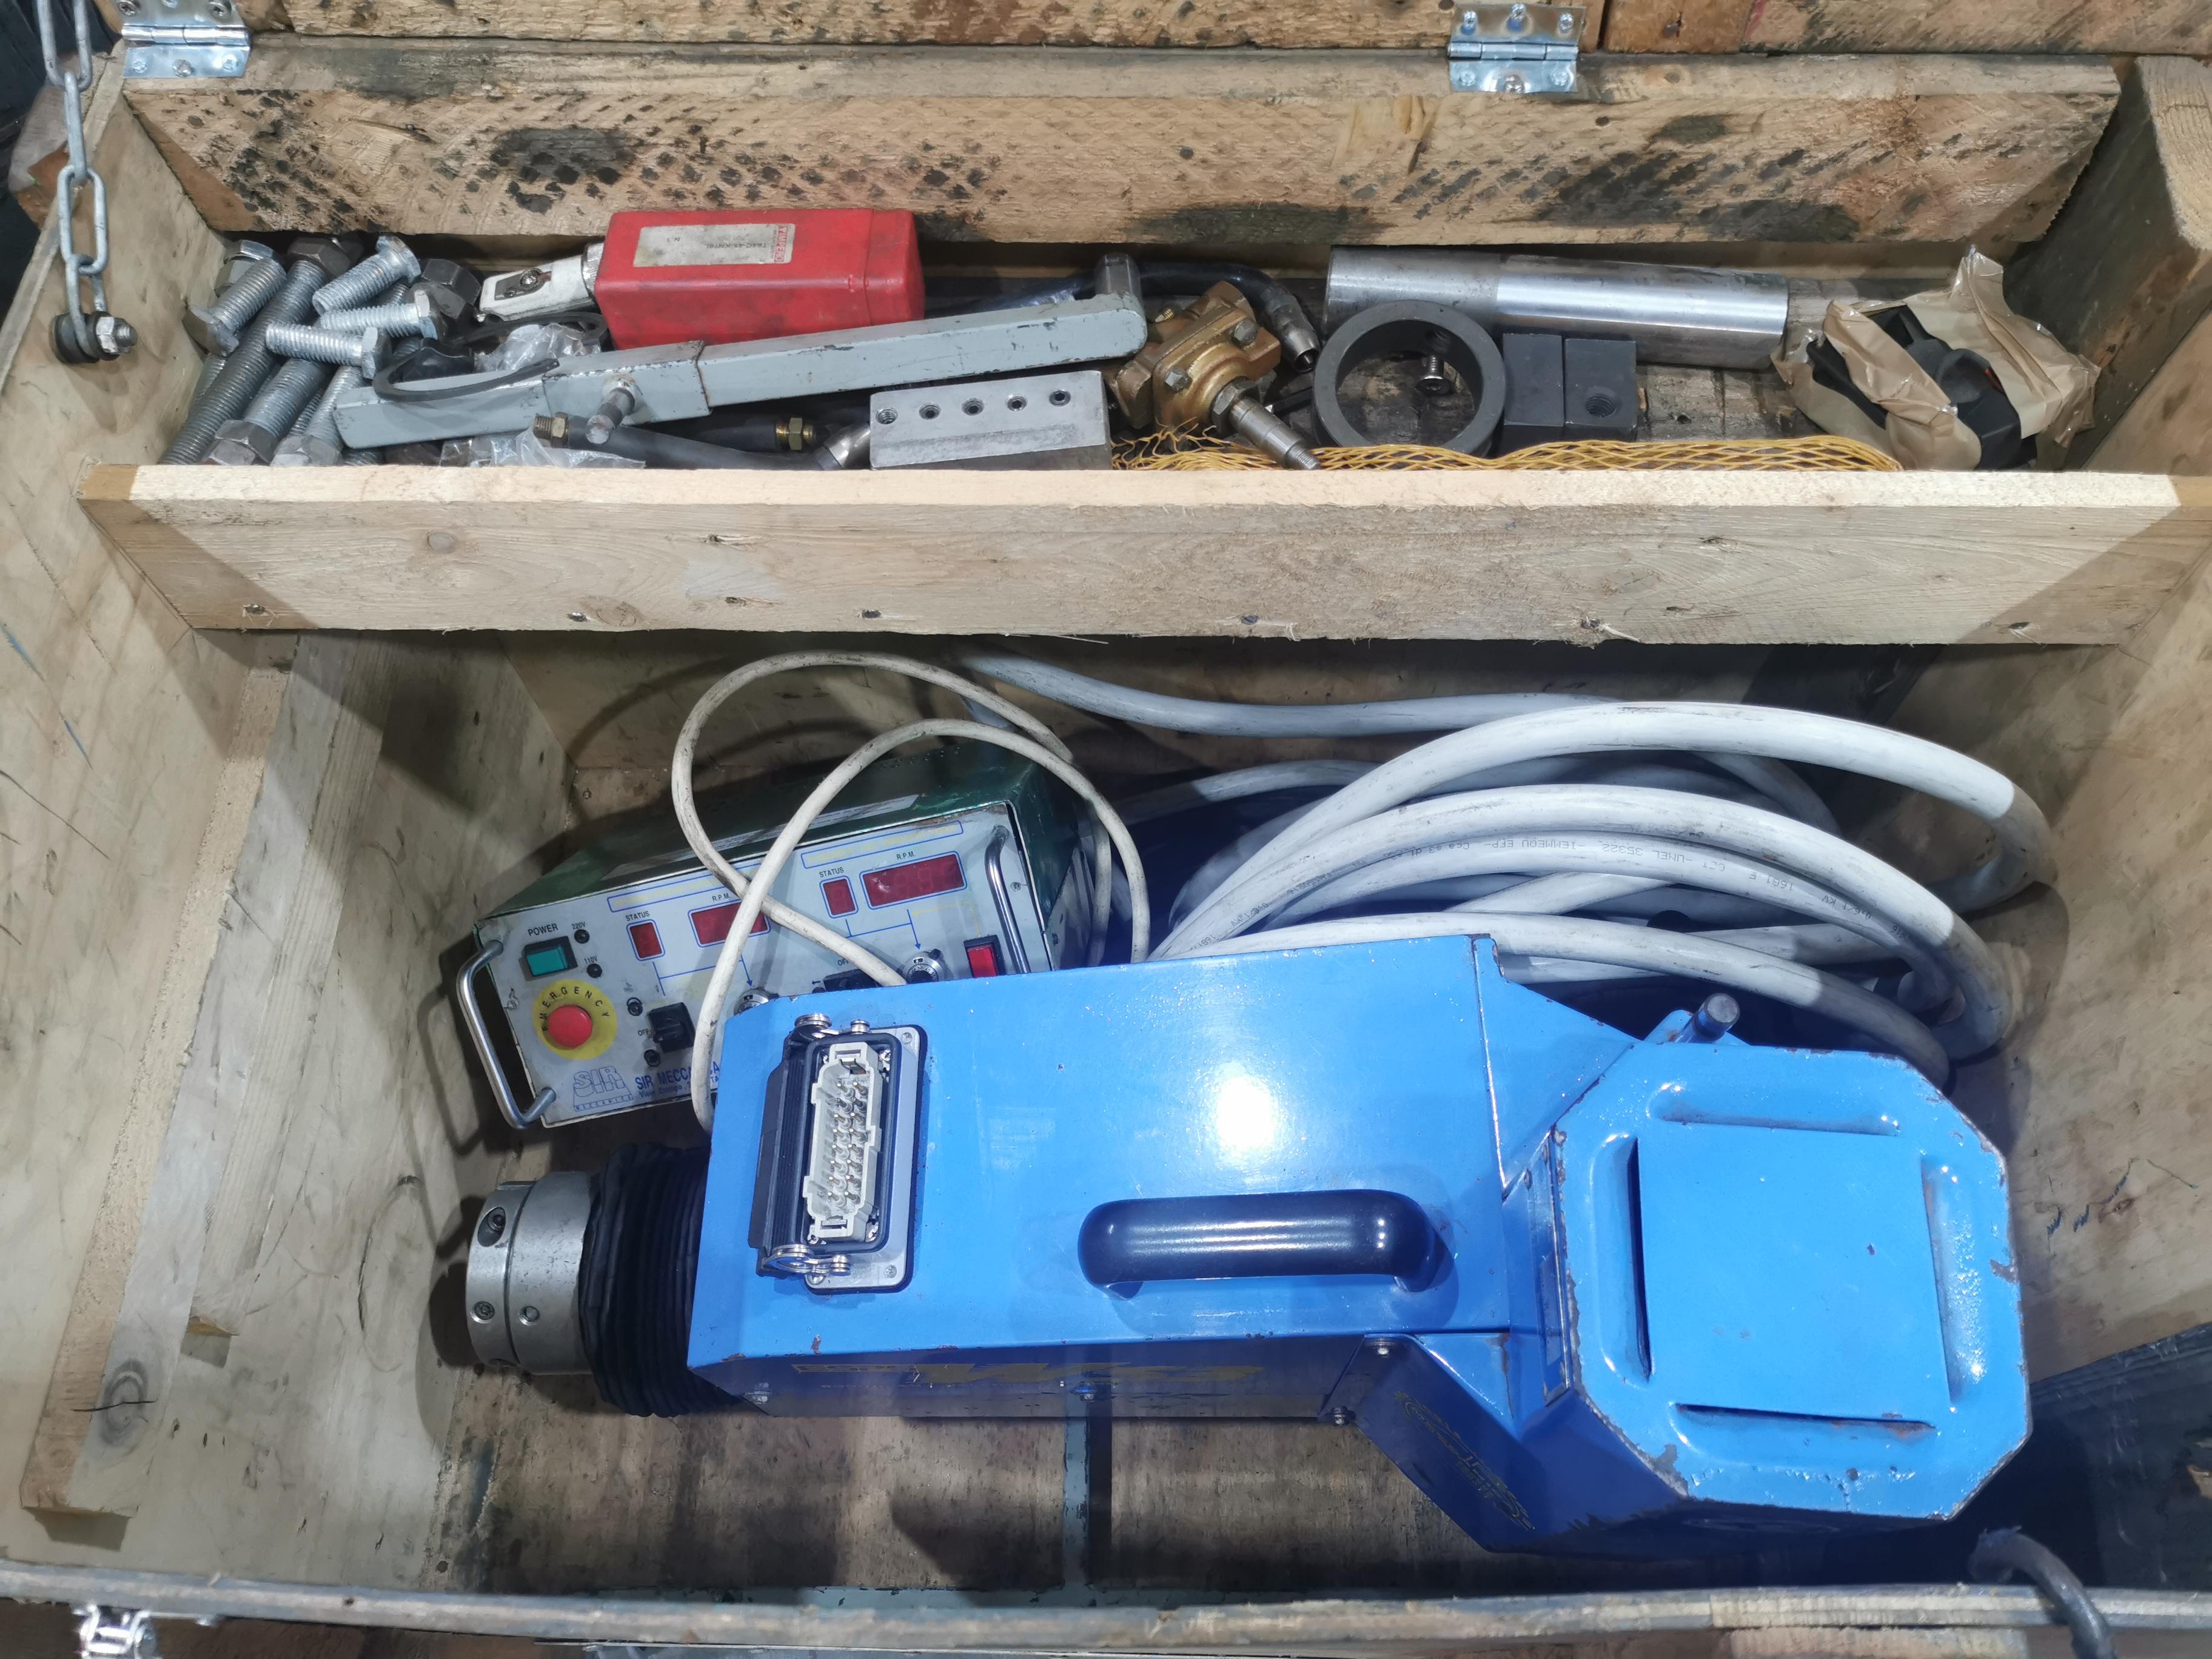 Barenatrice portatile sir meccanica ws3 in vendita - foto 4